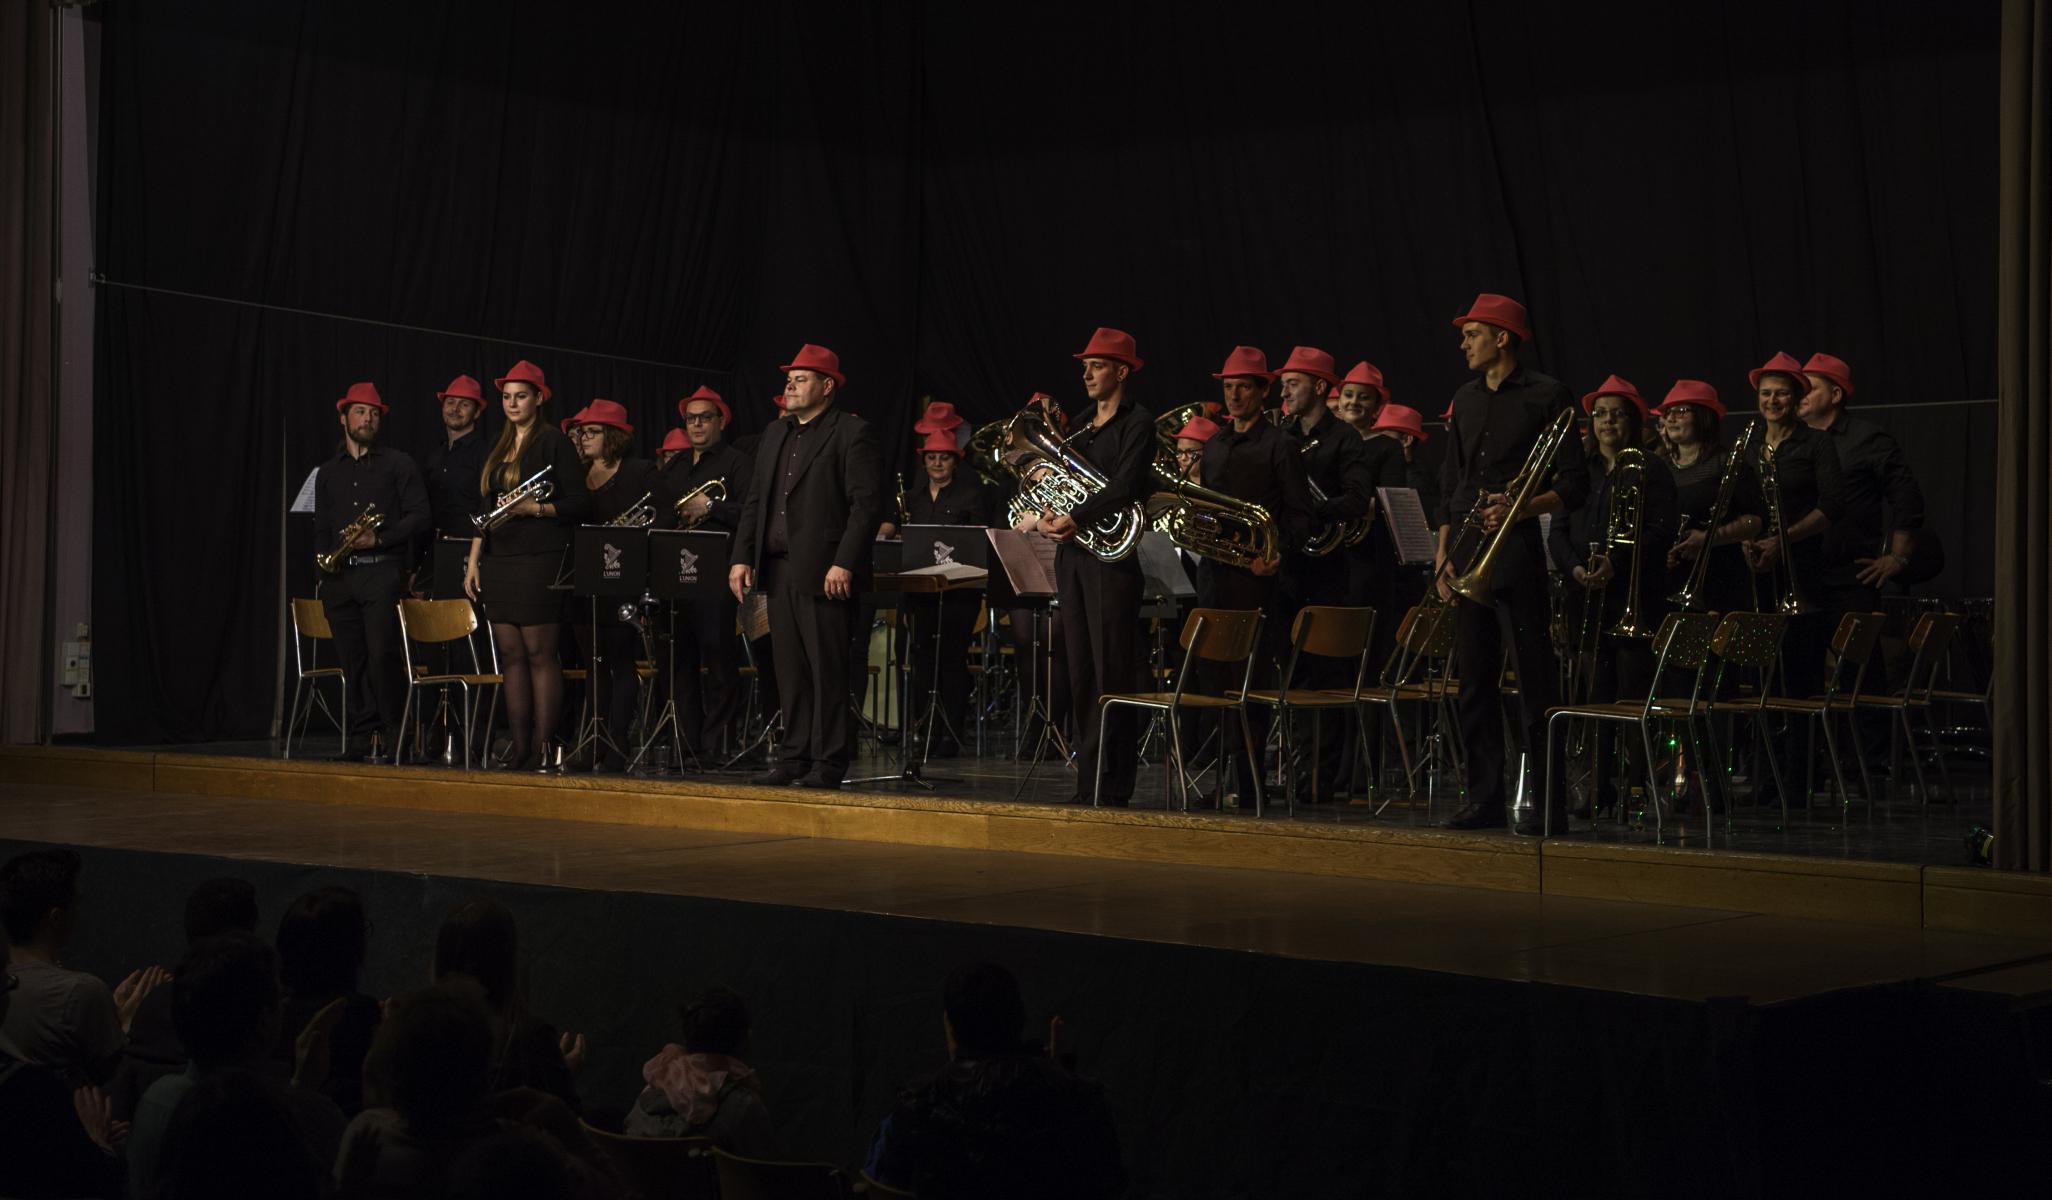 170211_concert_annuel17-069